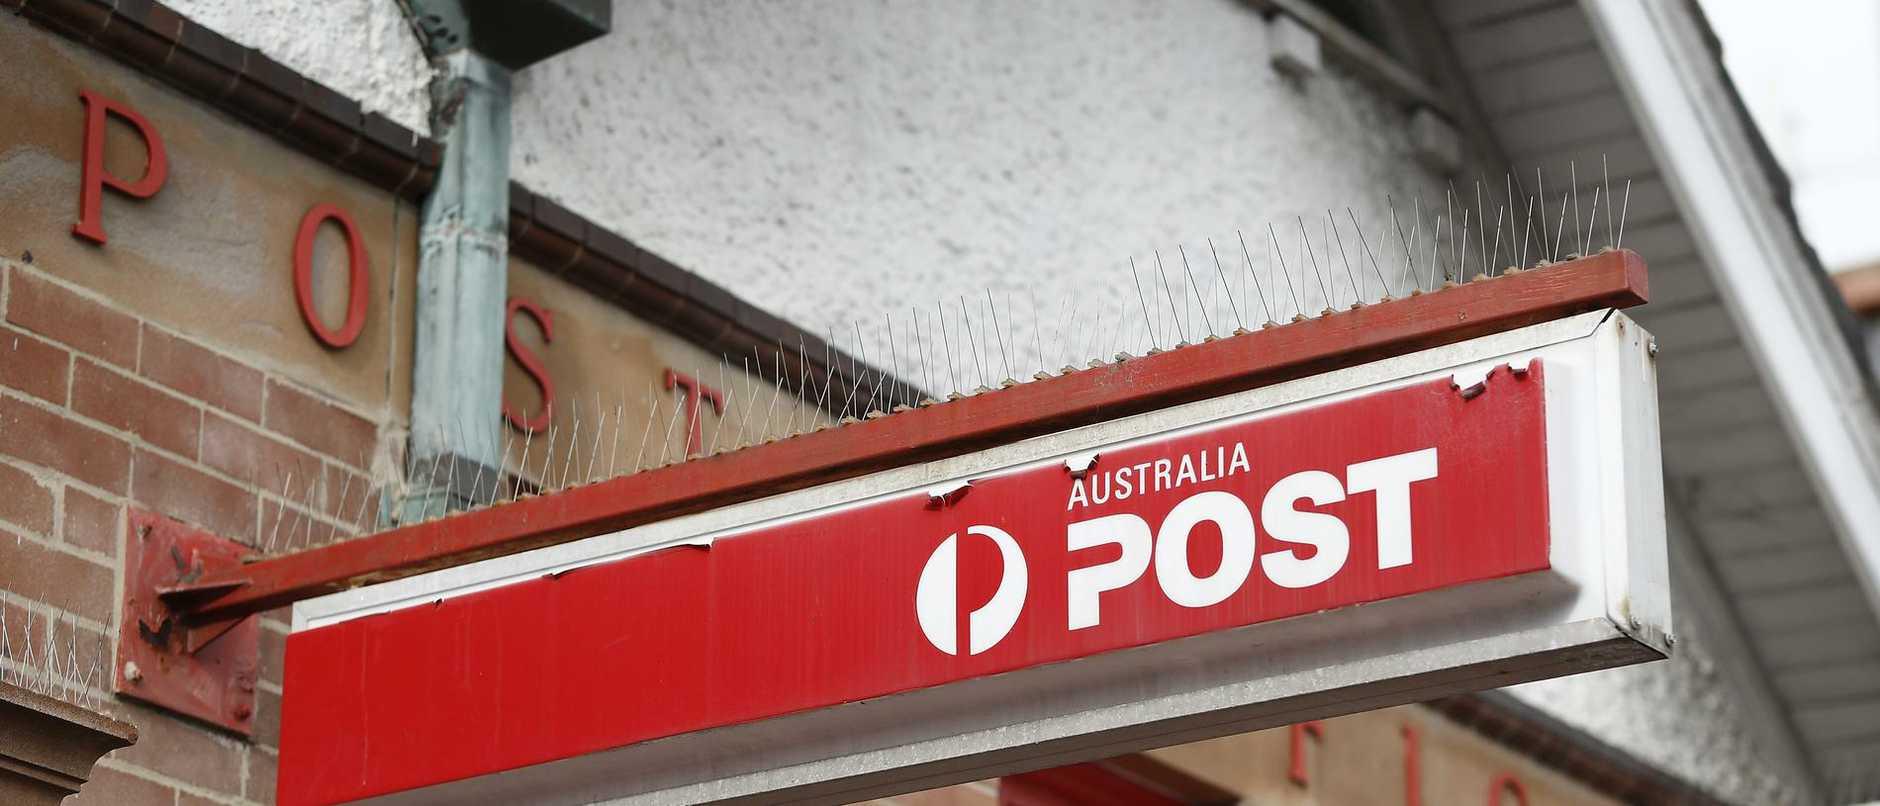 Australia Post Management Under Fire Over Senior Executive Gifts Disclosed During Senate Estimates